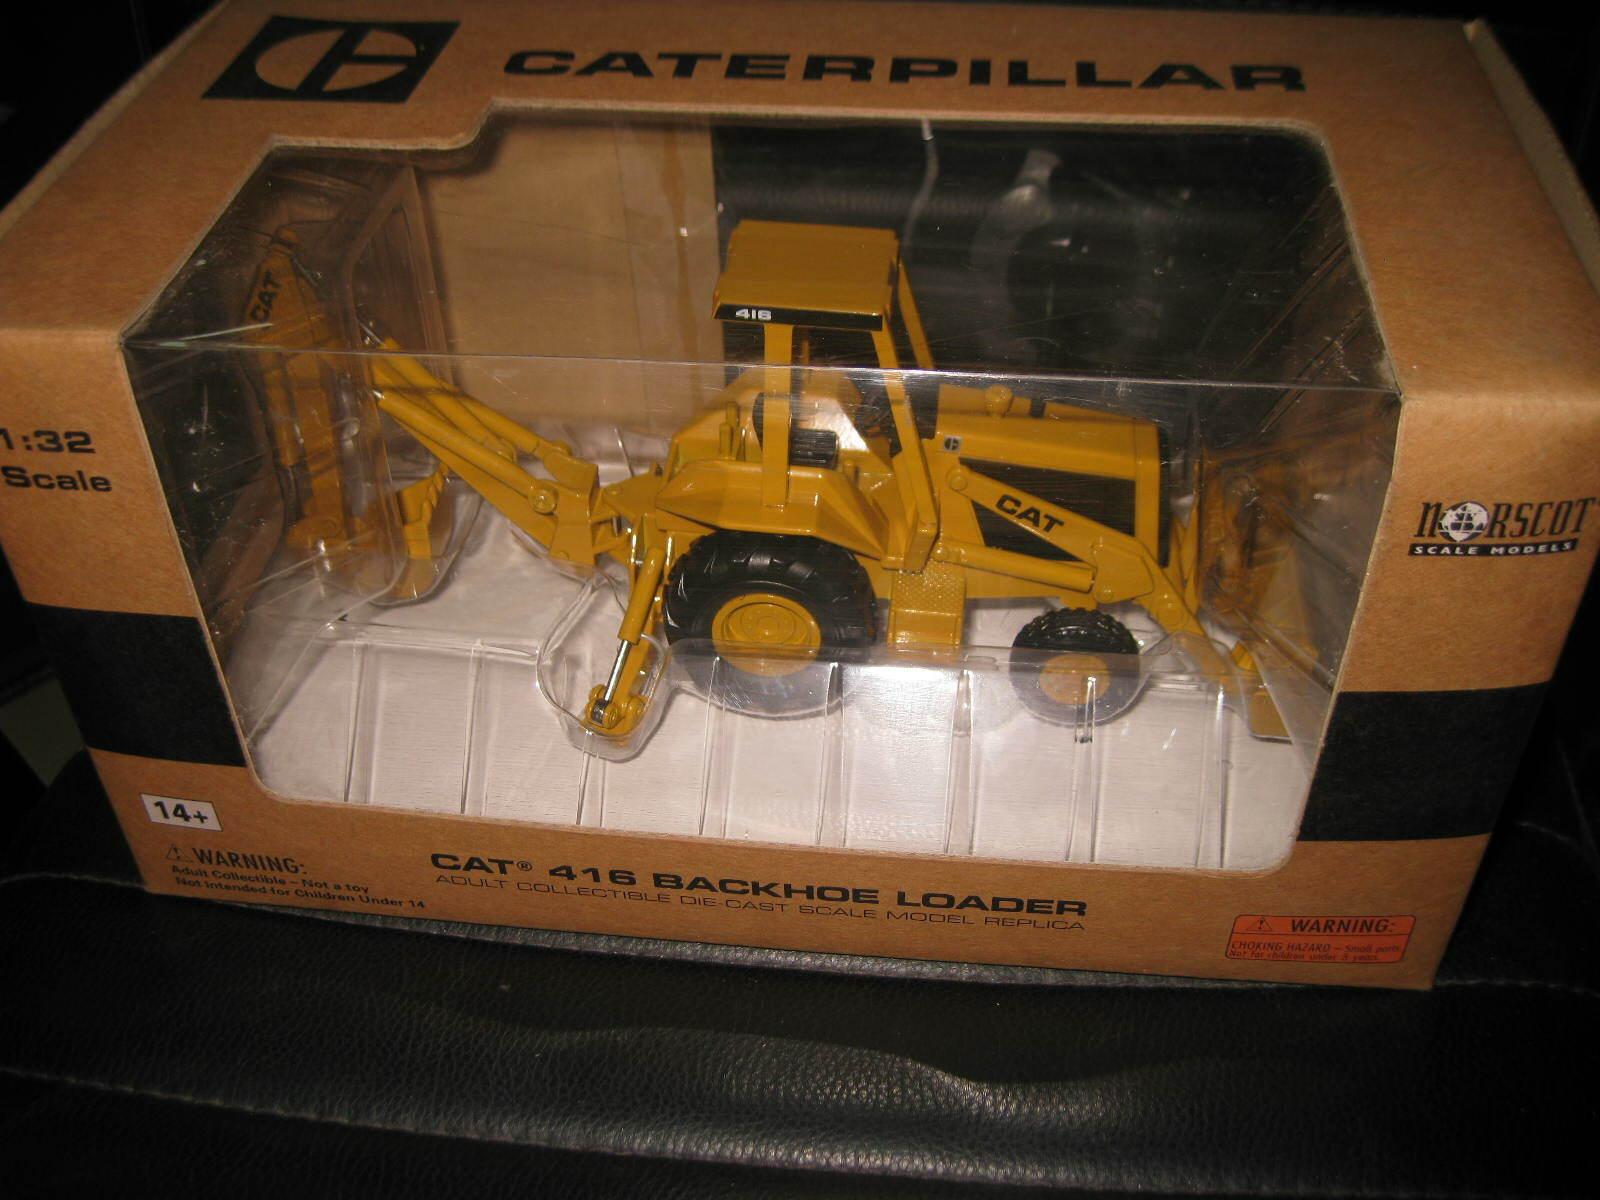 CAT CATERPILLAR 1 32  NORSCOT 416 BACKHOE LOADER BLOCK C LOGO  55271  negozio STOCK